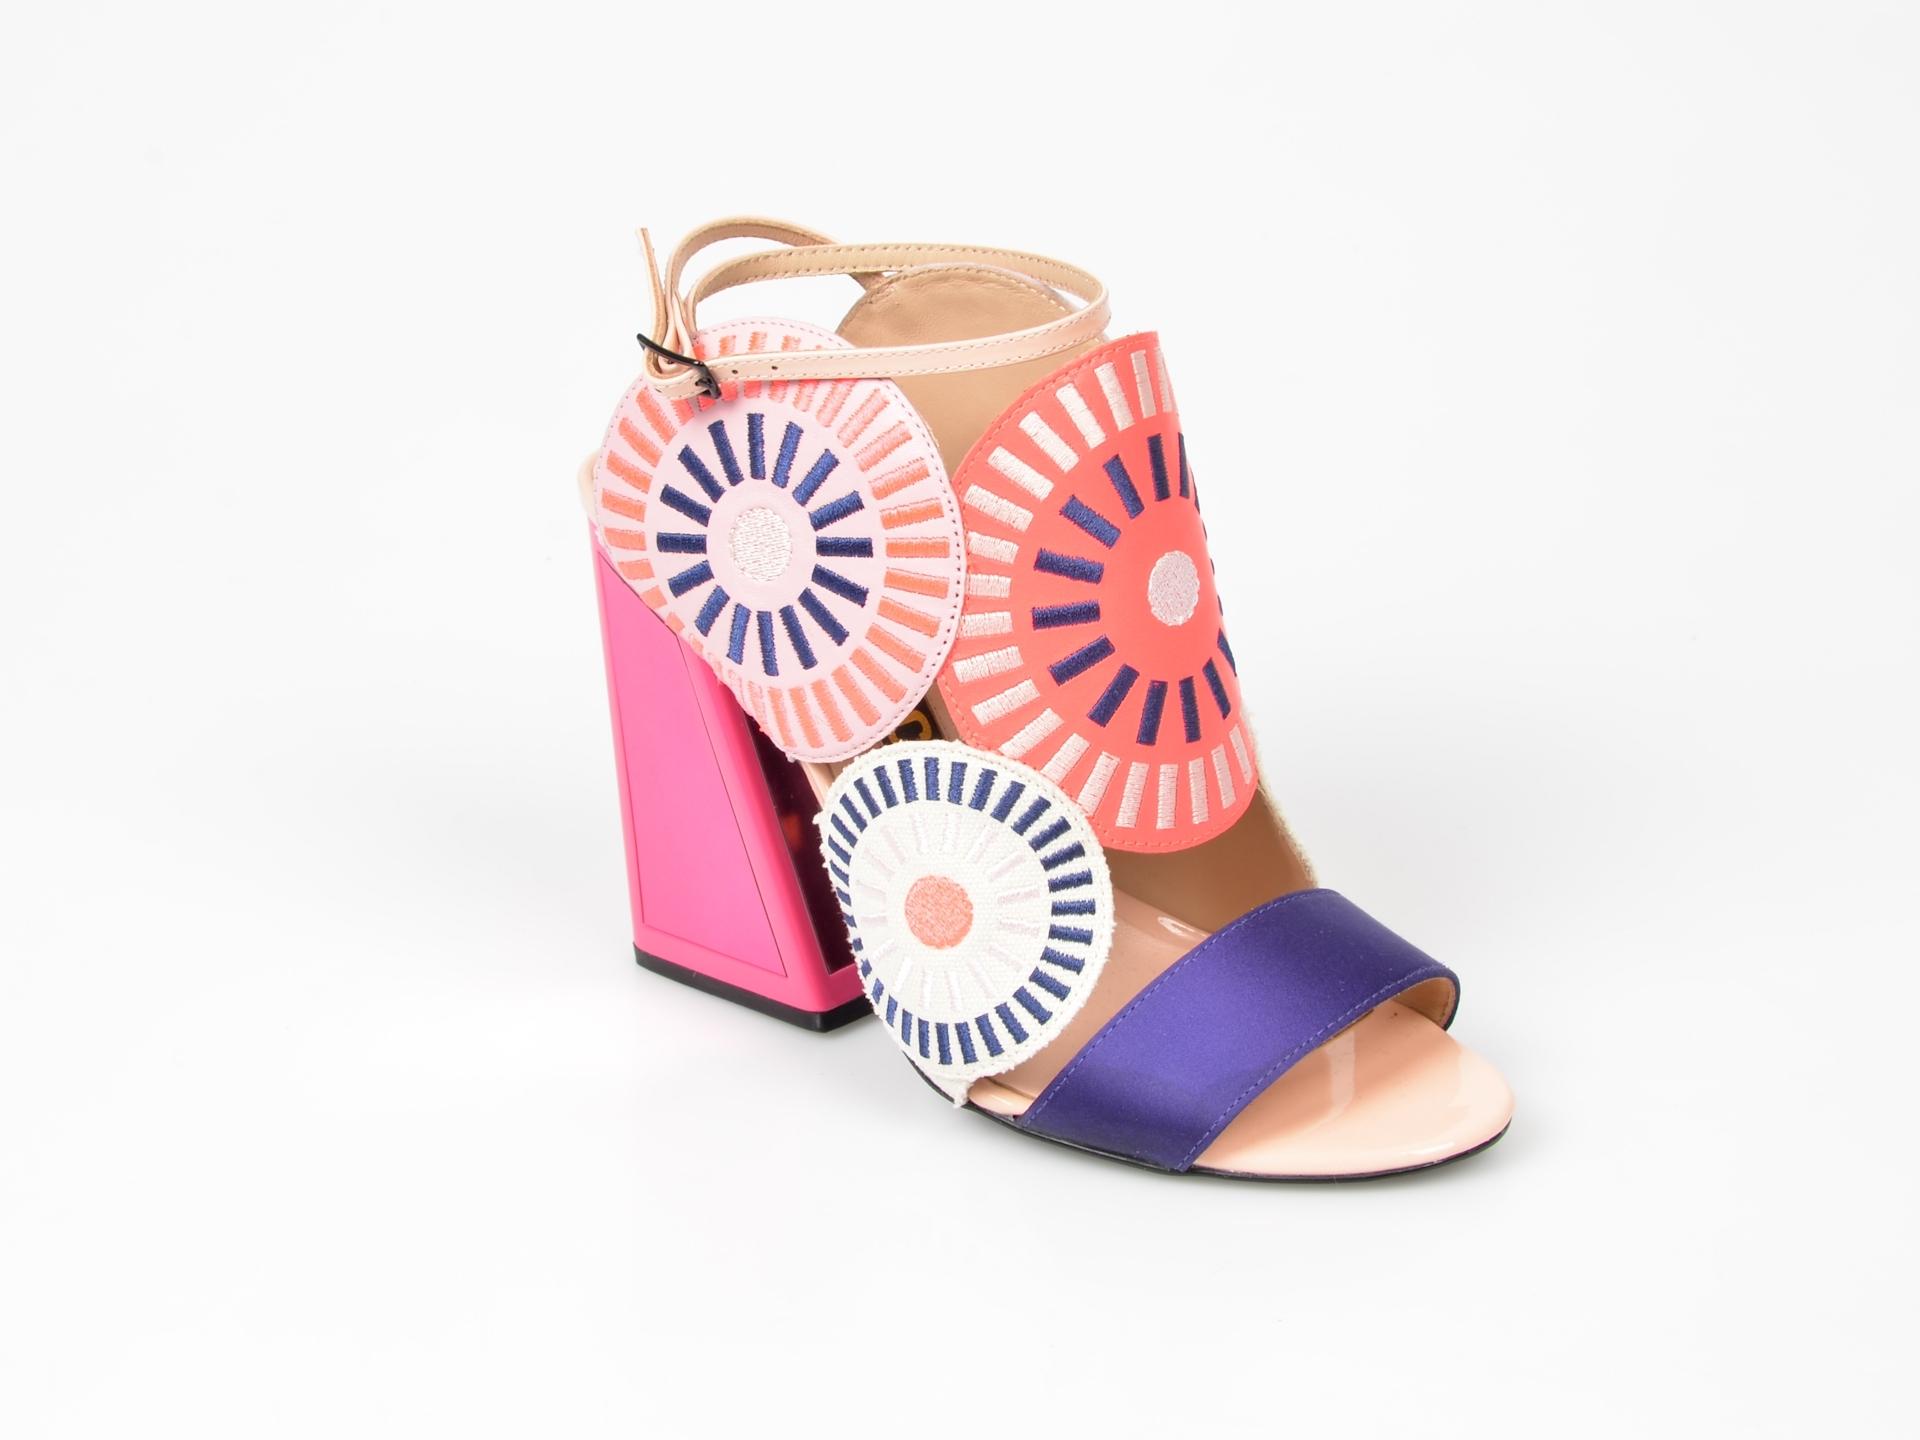 Sandale KAT MACONIE FOR EPICA roz, din piele ecologica